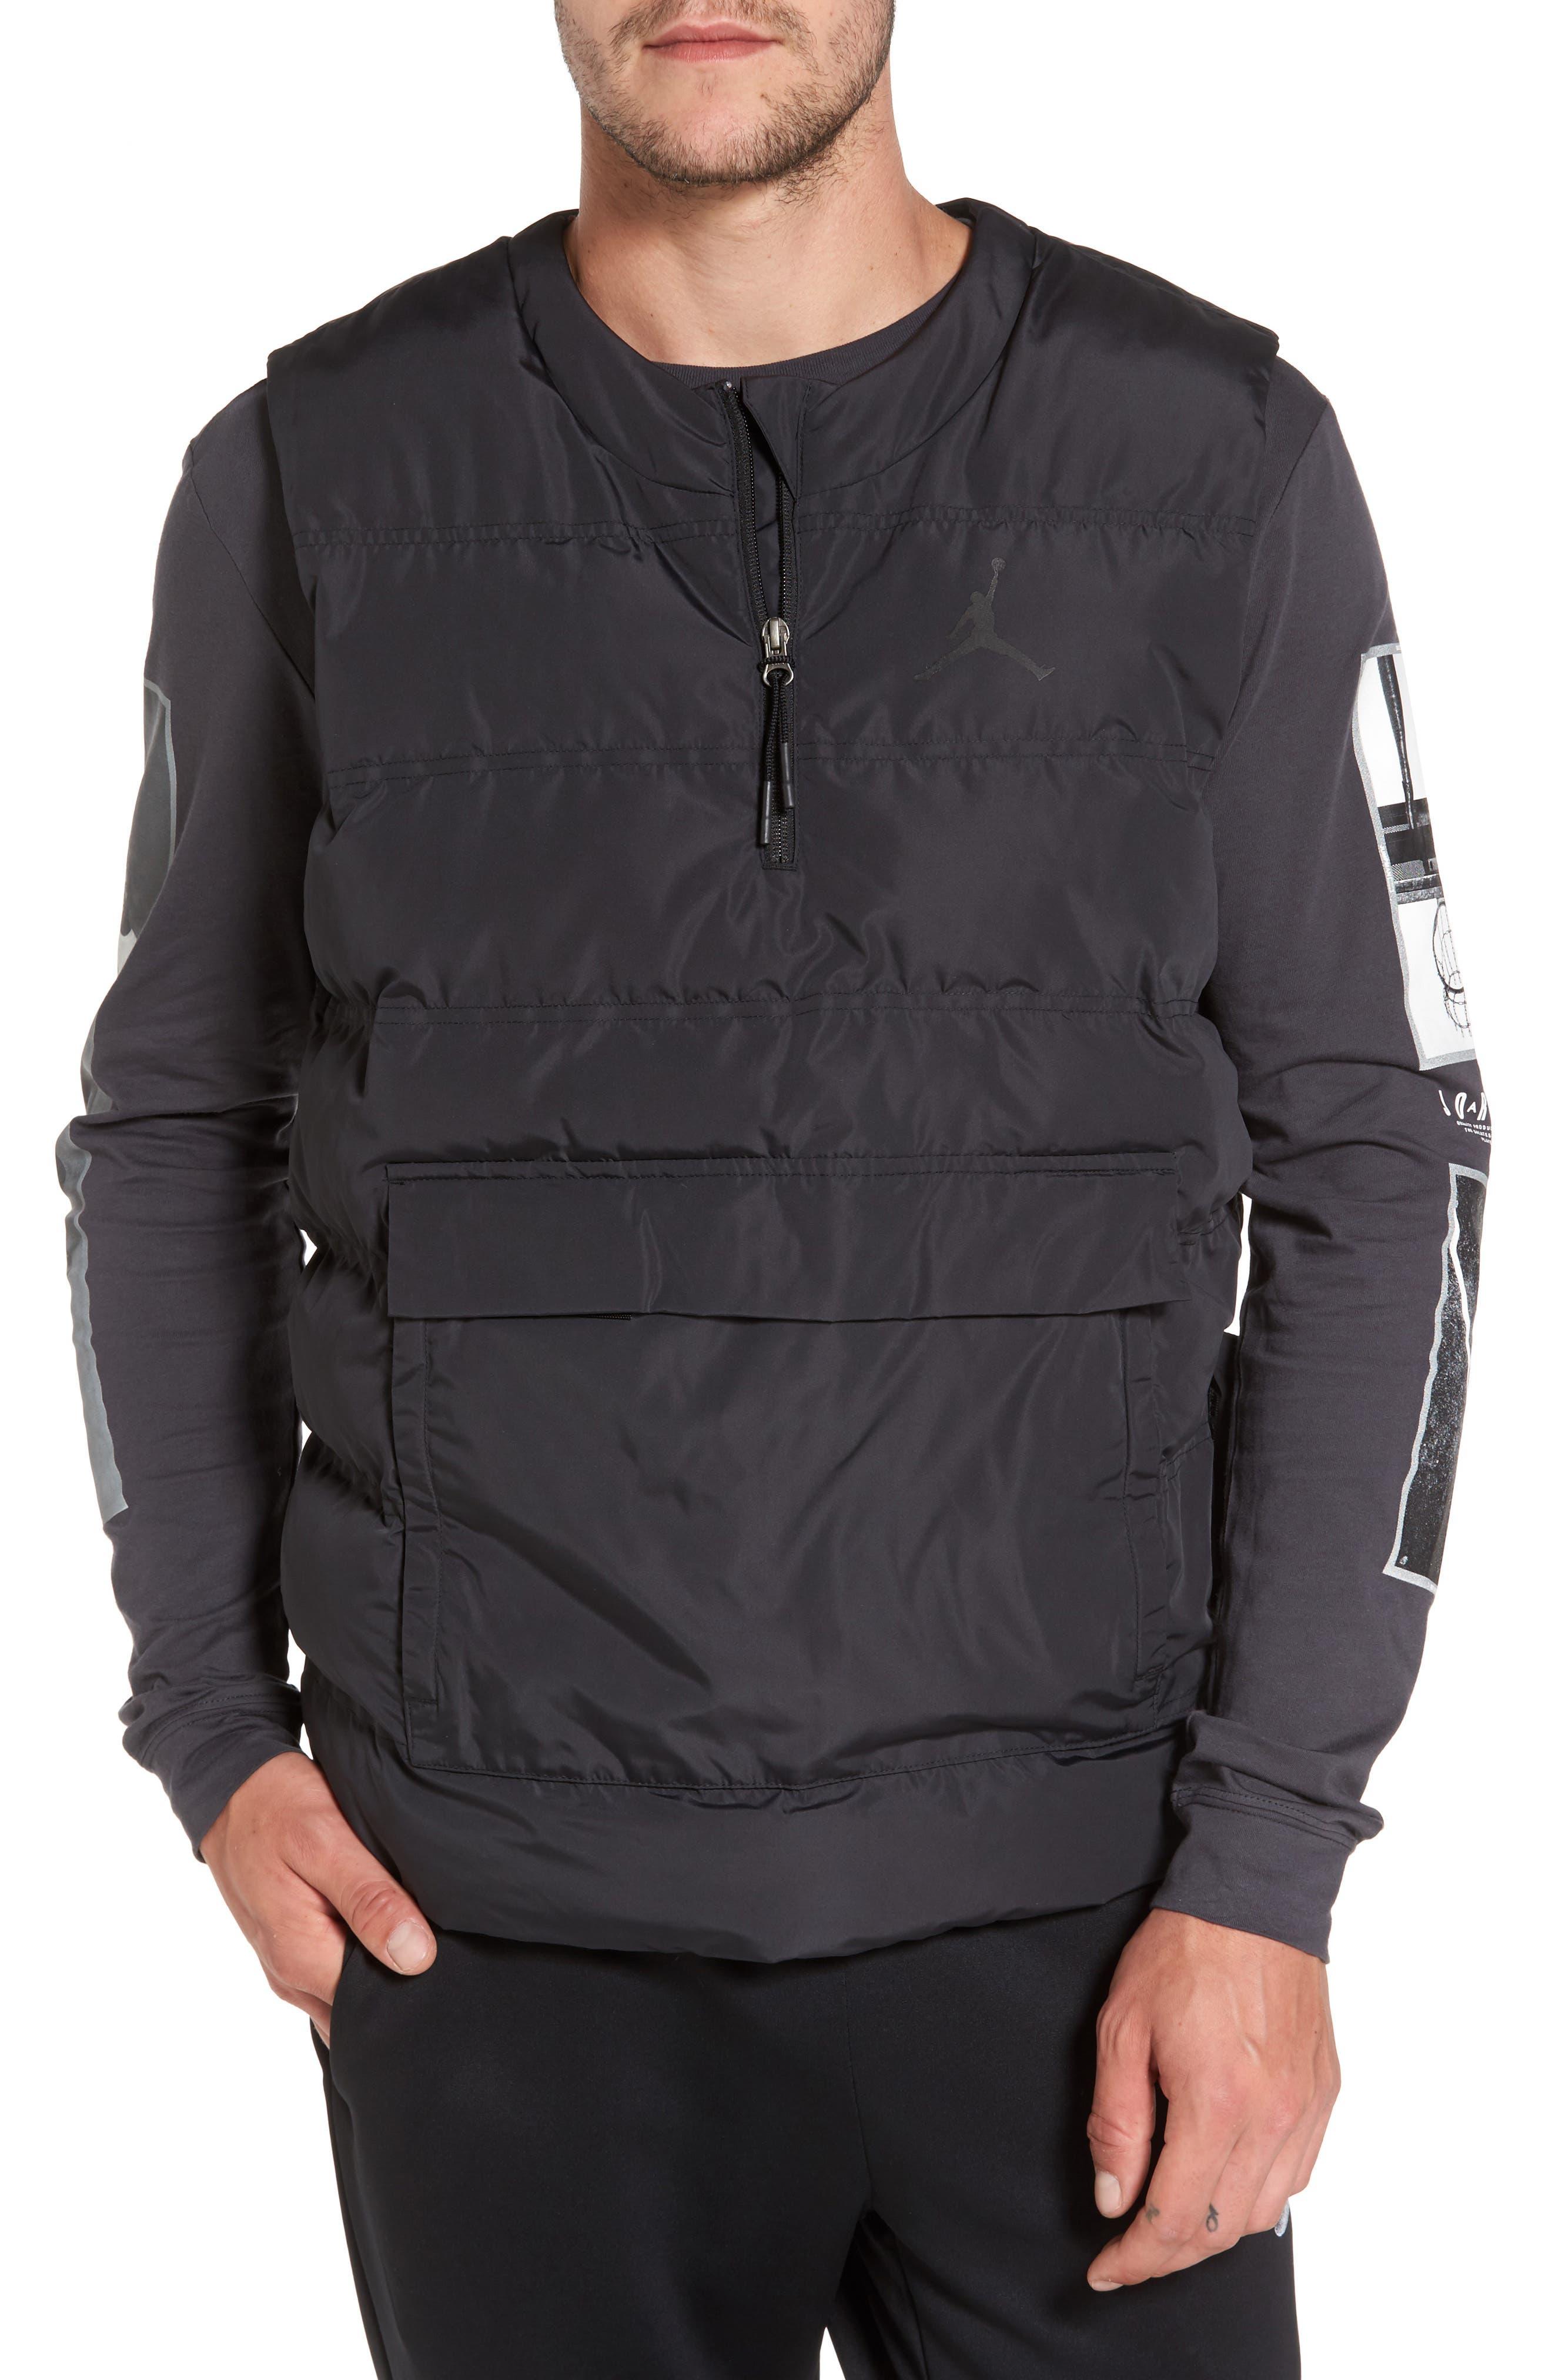 Alternate Image 1 Selected - Nike Jordan 23 Tech Vest